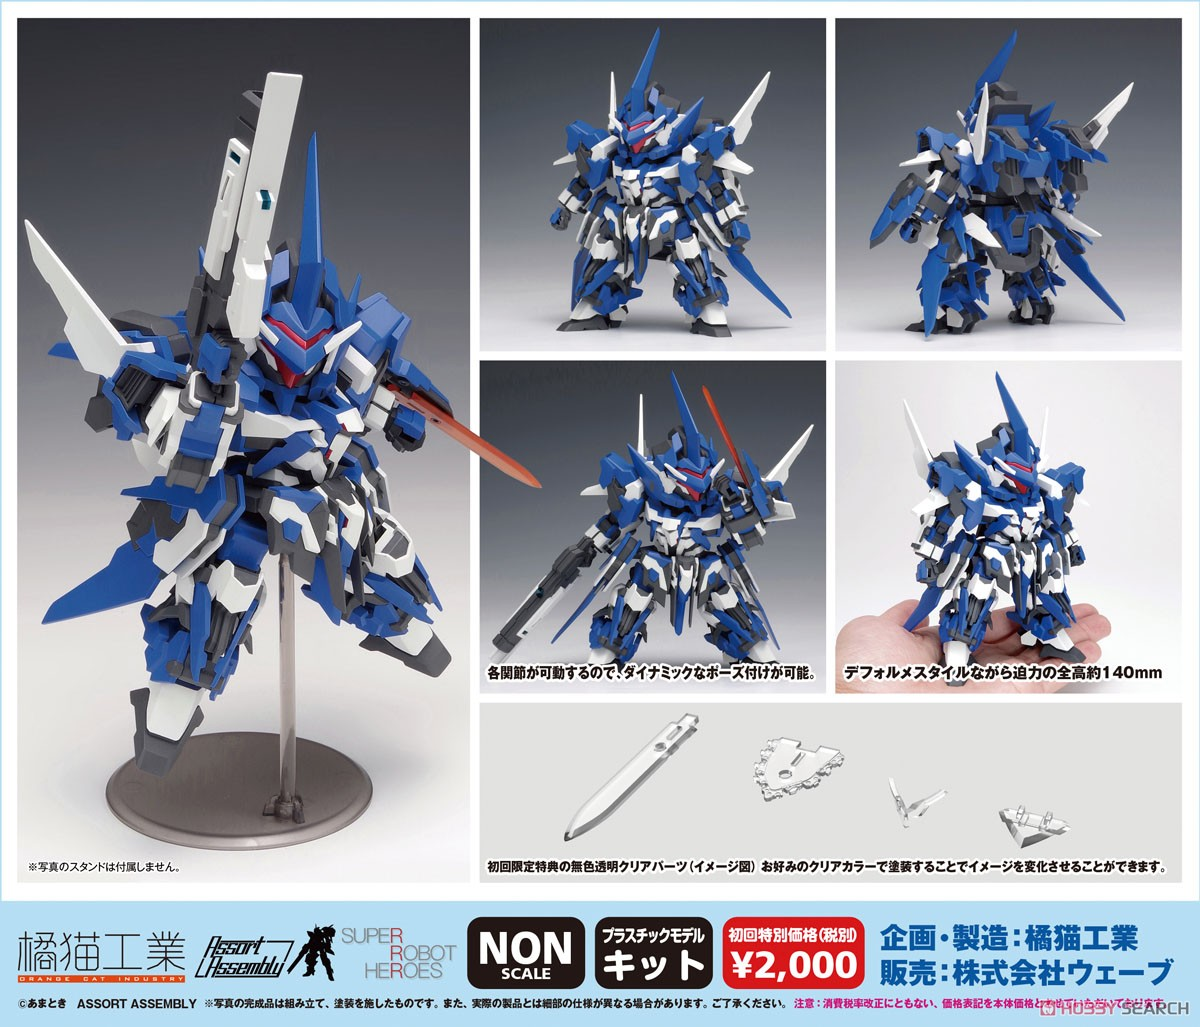 SUPER ROBOT HEROES『イクスクレア(初回特別価格版)』プラモデル-009